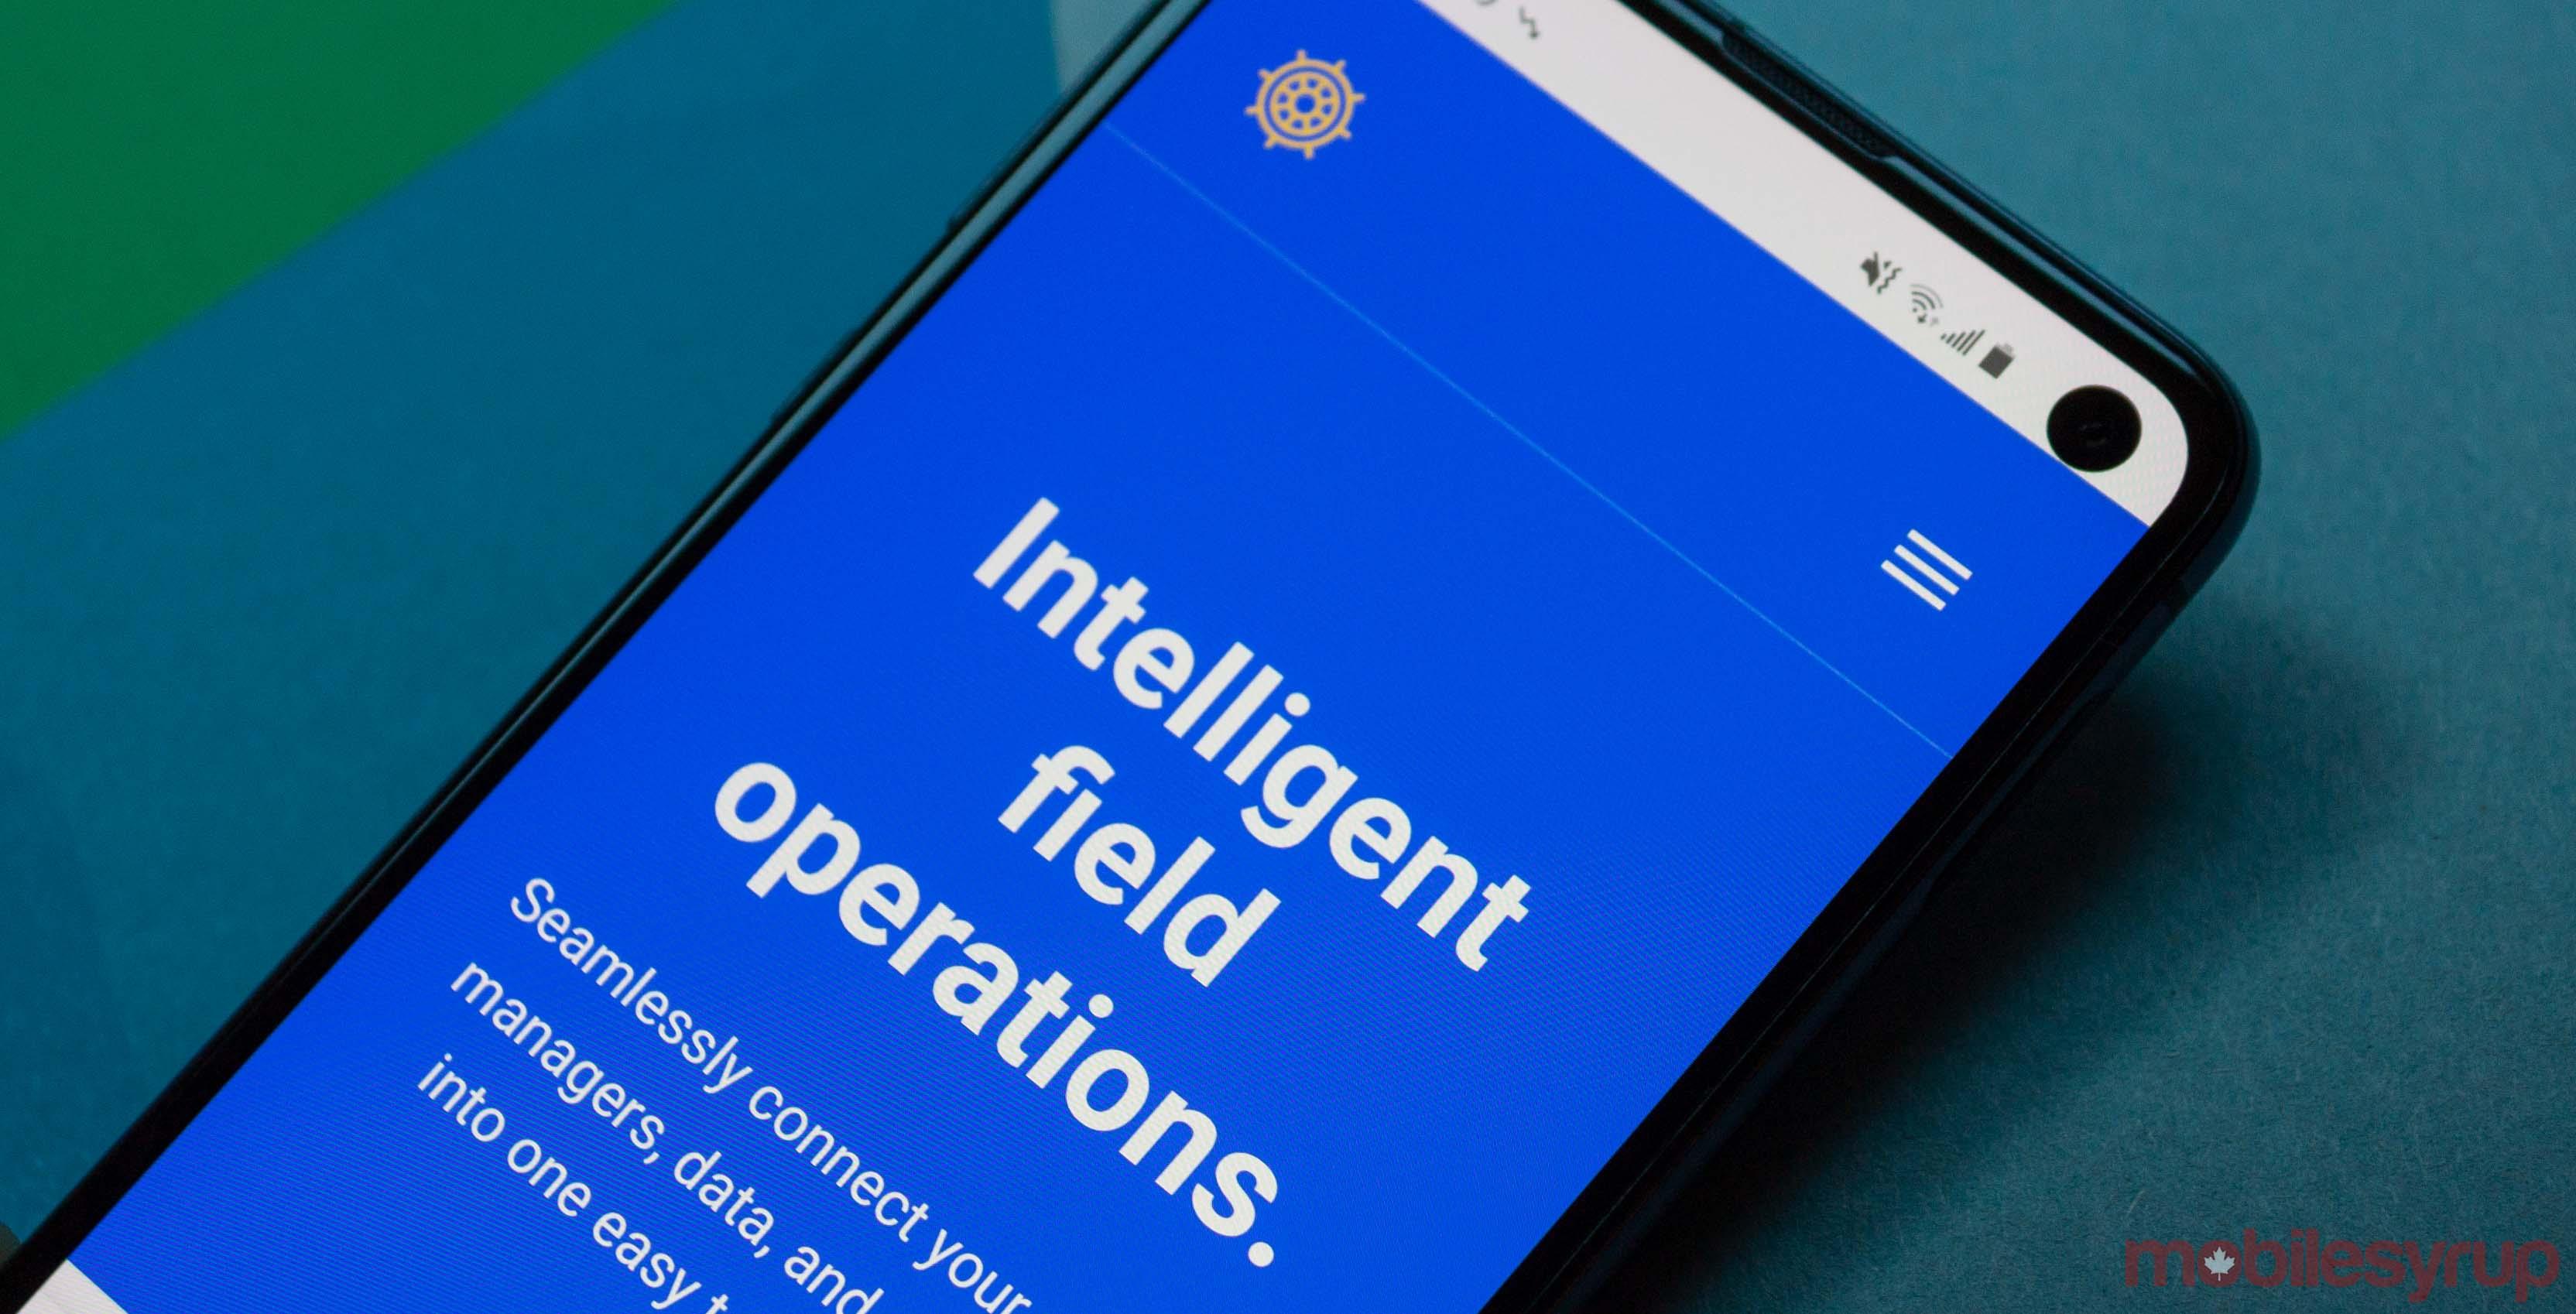 Lightship Works emergency response app integrates AI with IBM Watson